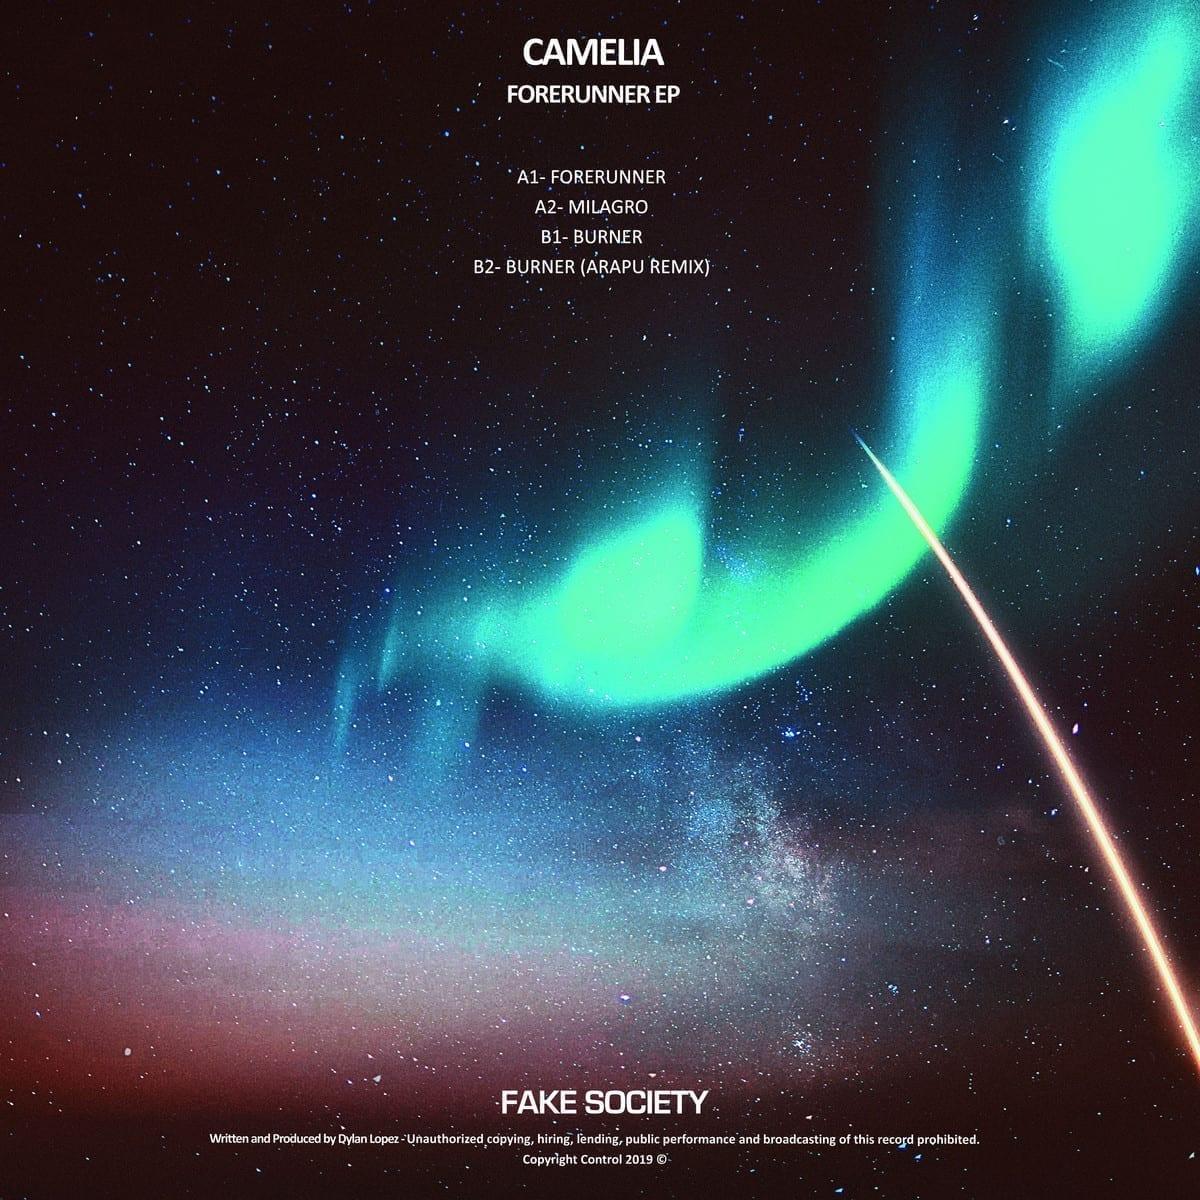 camelia - forerunner ep [fake society] back